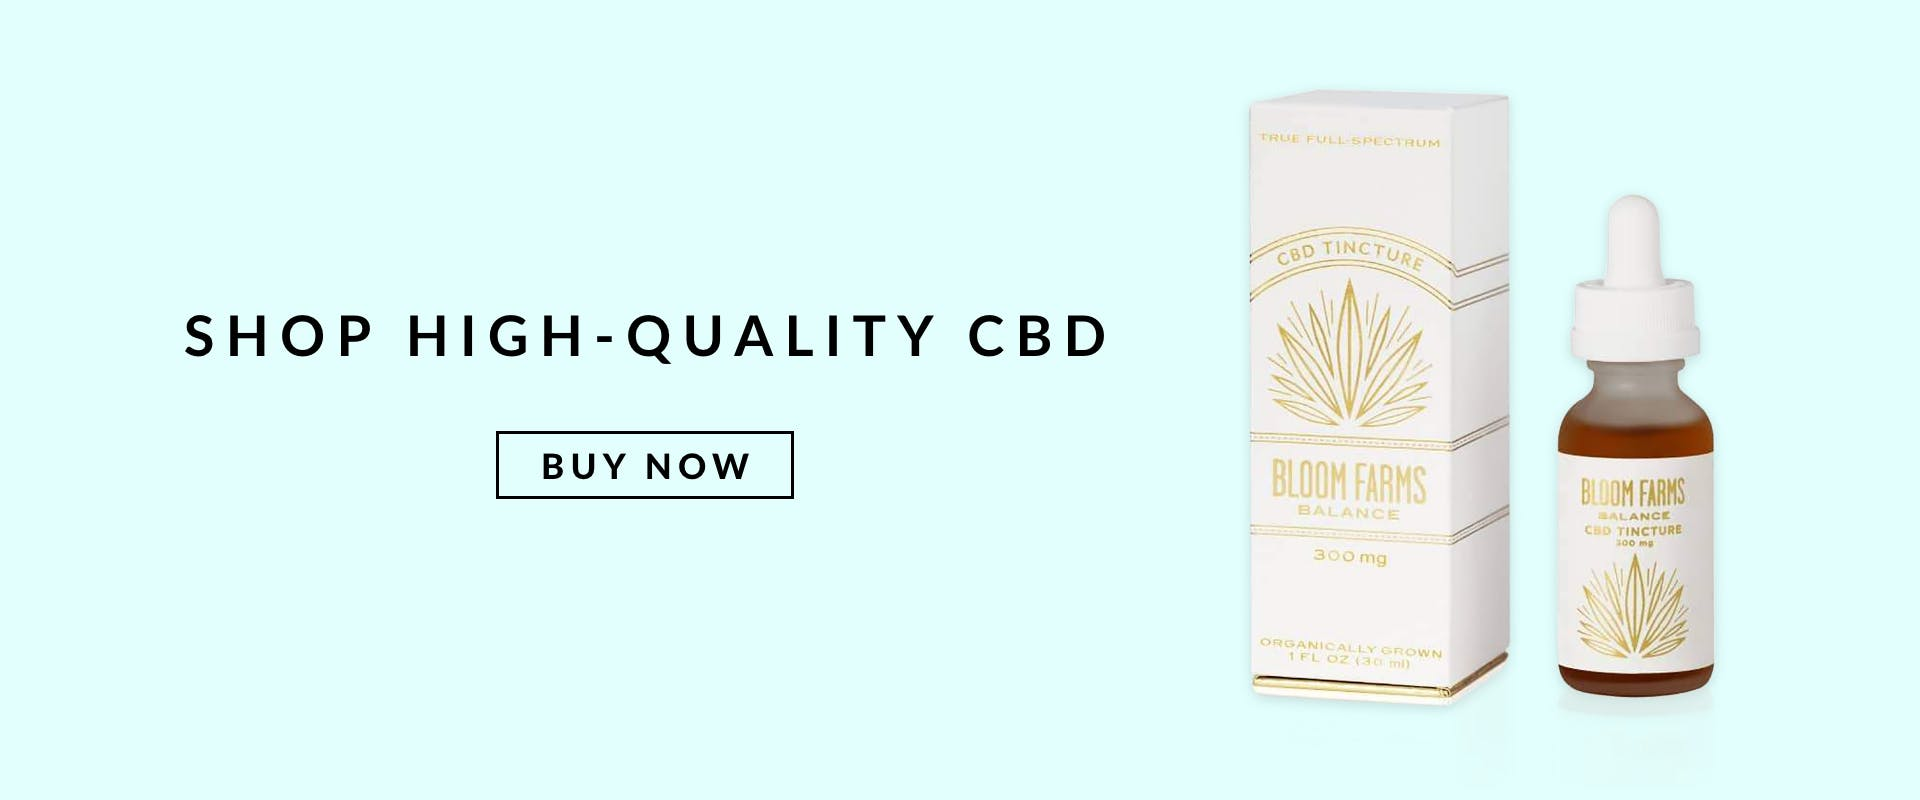 Shop high-quality CBD